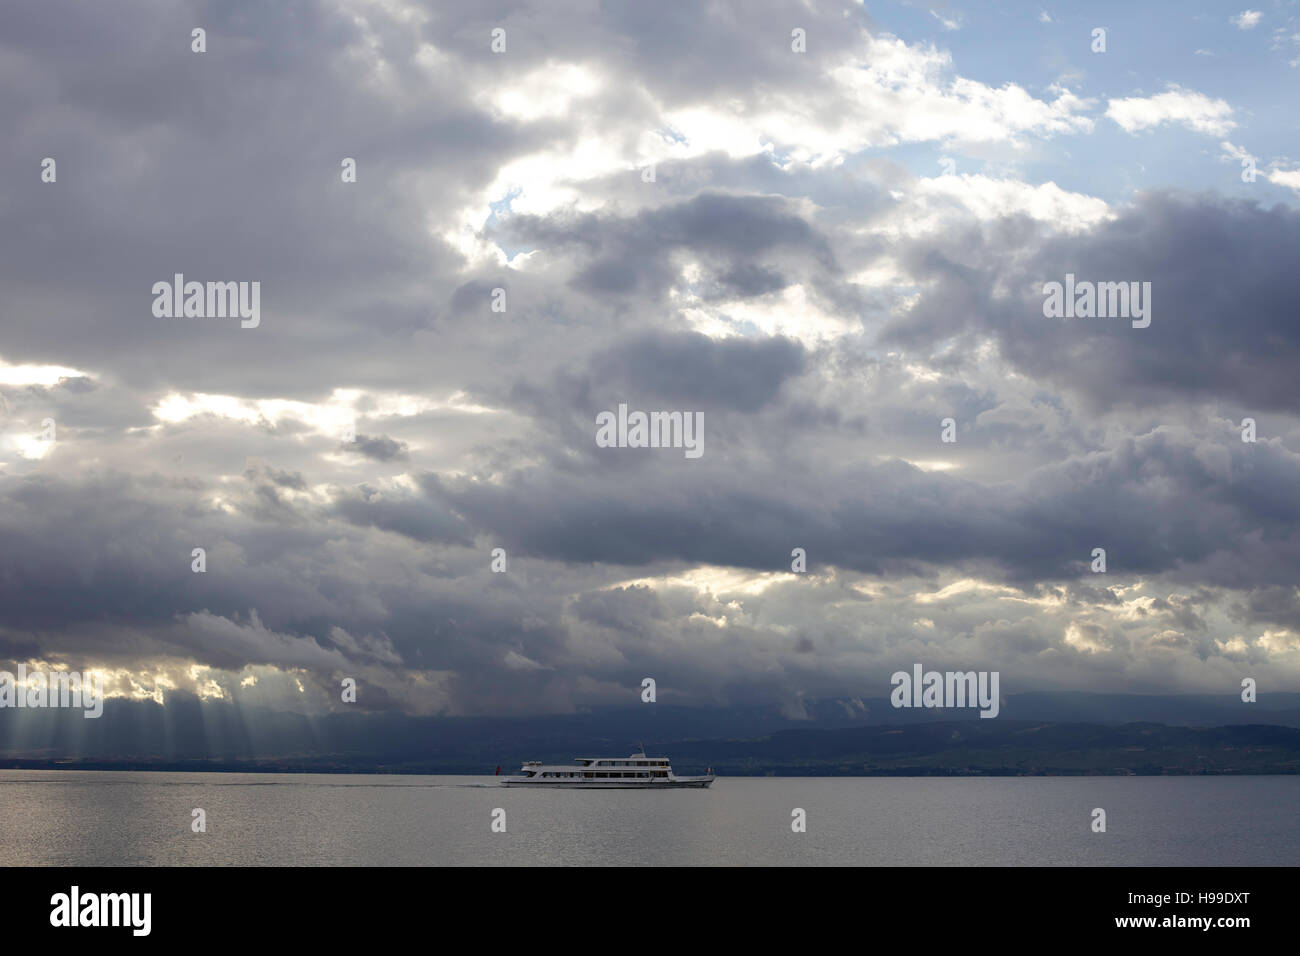 Ferry boat sailing on Lake Geneva under heavy cloud. Stock Photo